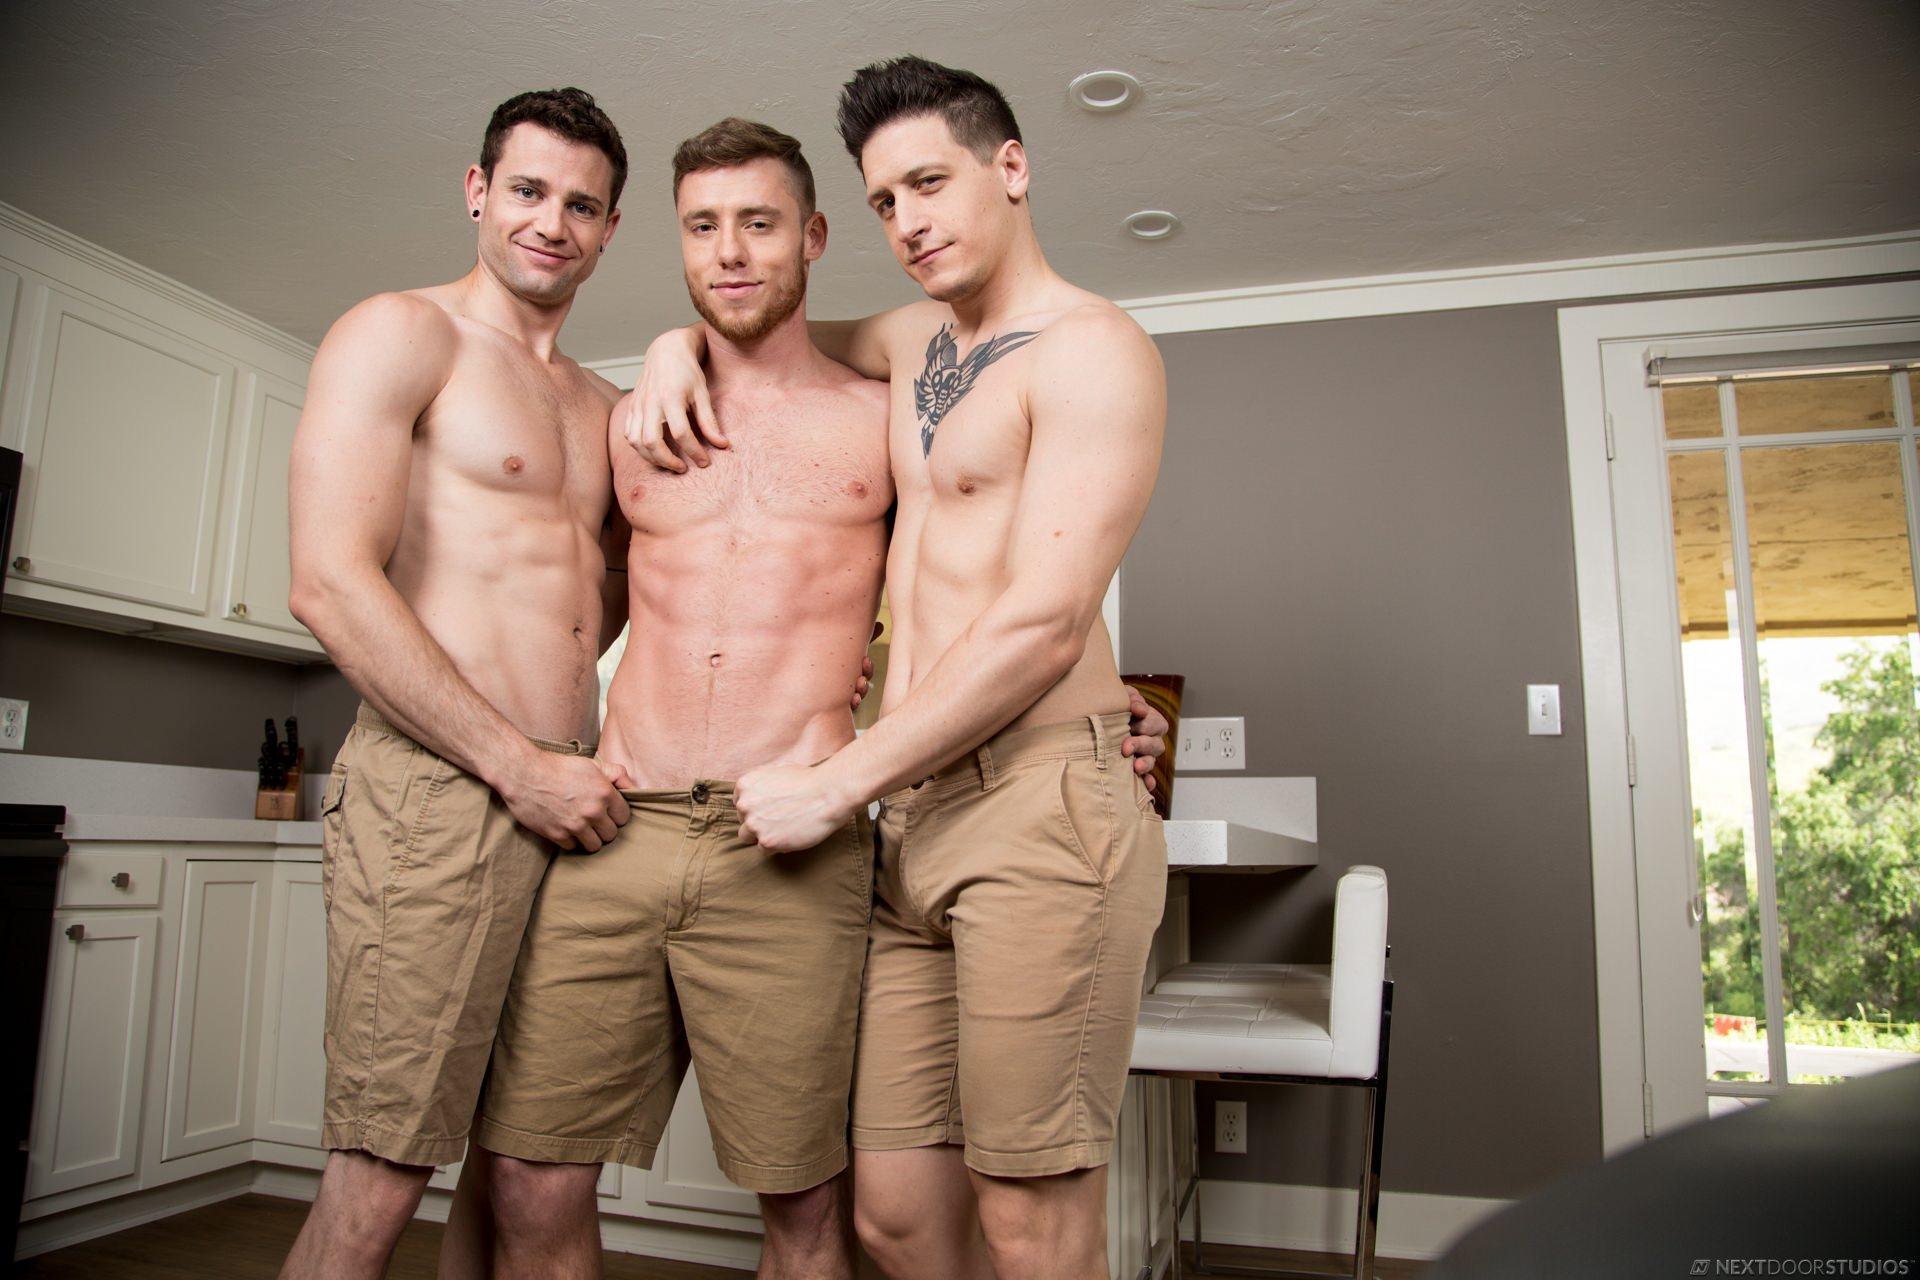 Next Door Studios 'Couples Fix' starring Dalton Riley (Photo 14)